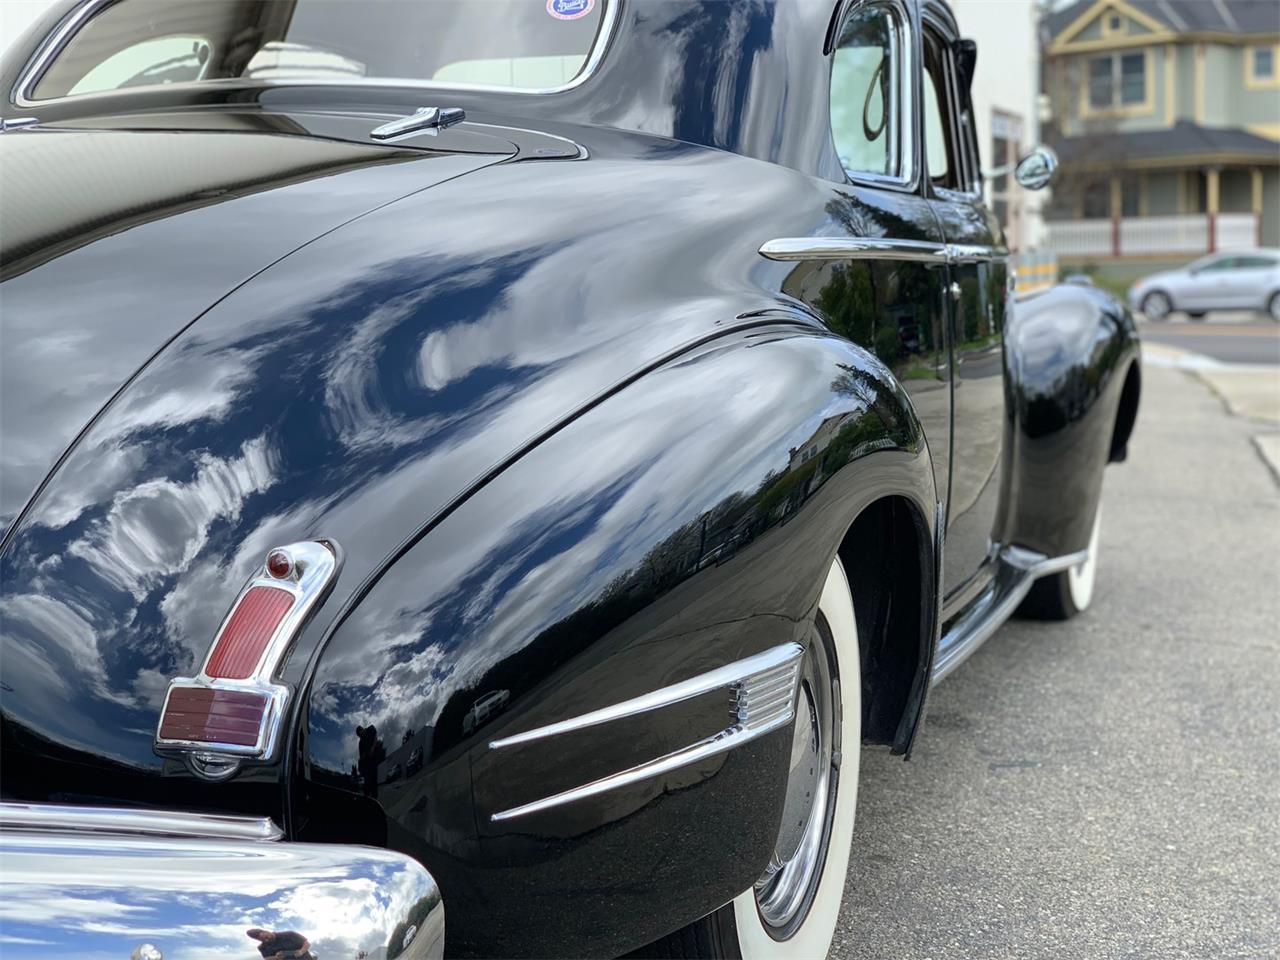 1941 Buick Model 56 (CC-1219125) for sale in Fairfield, California